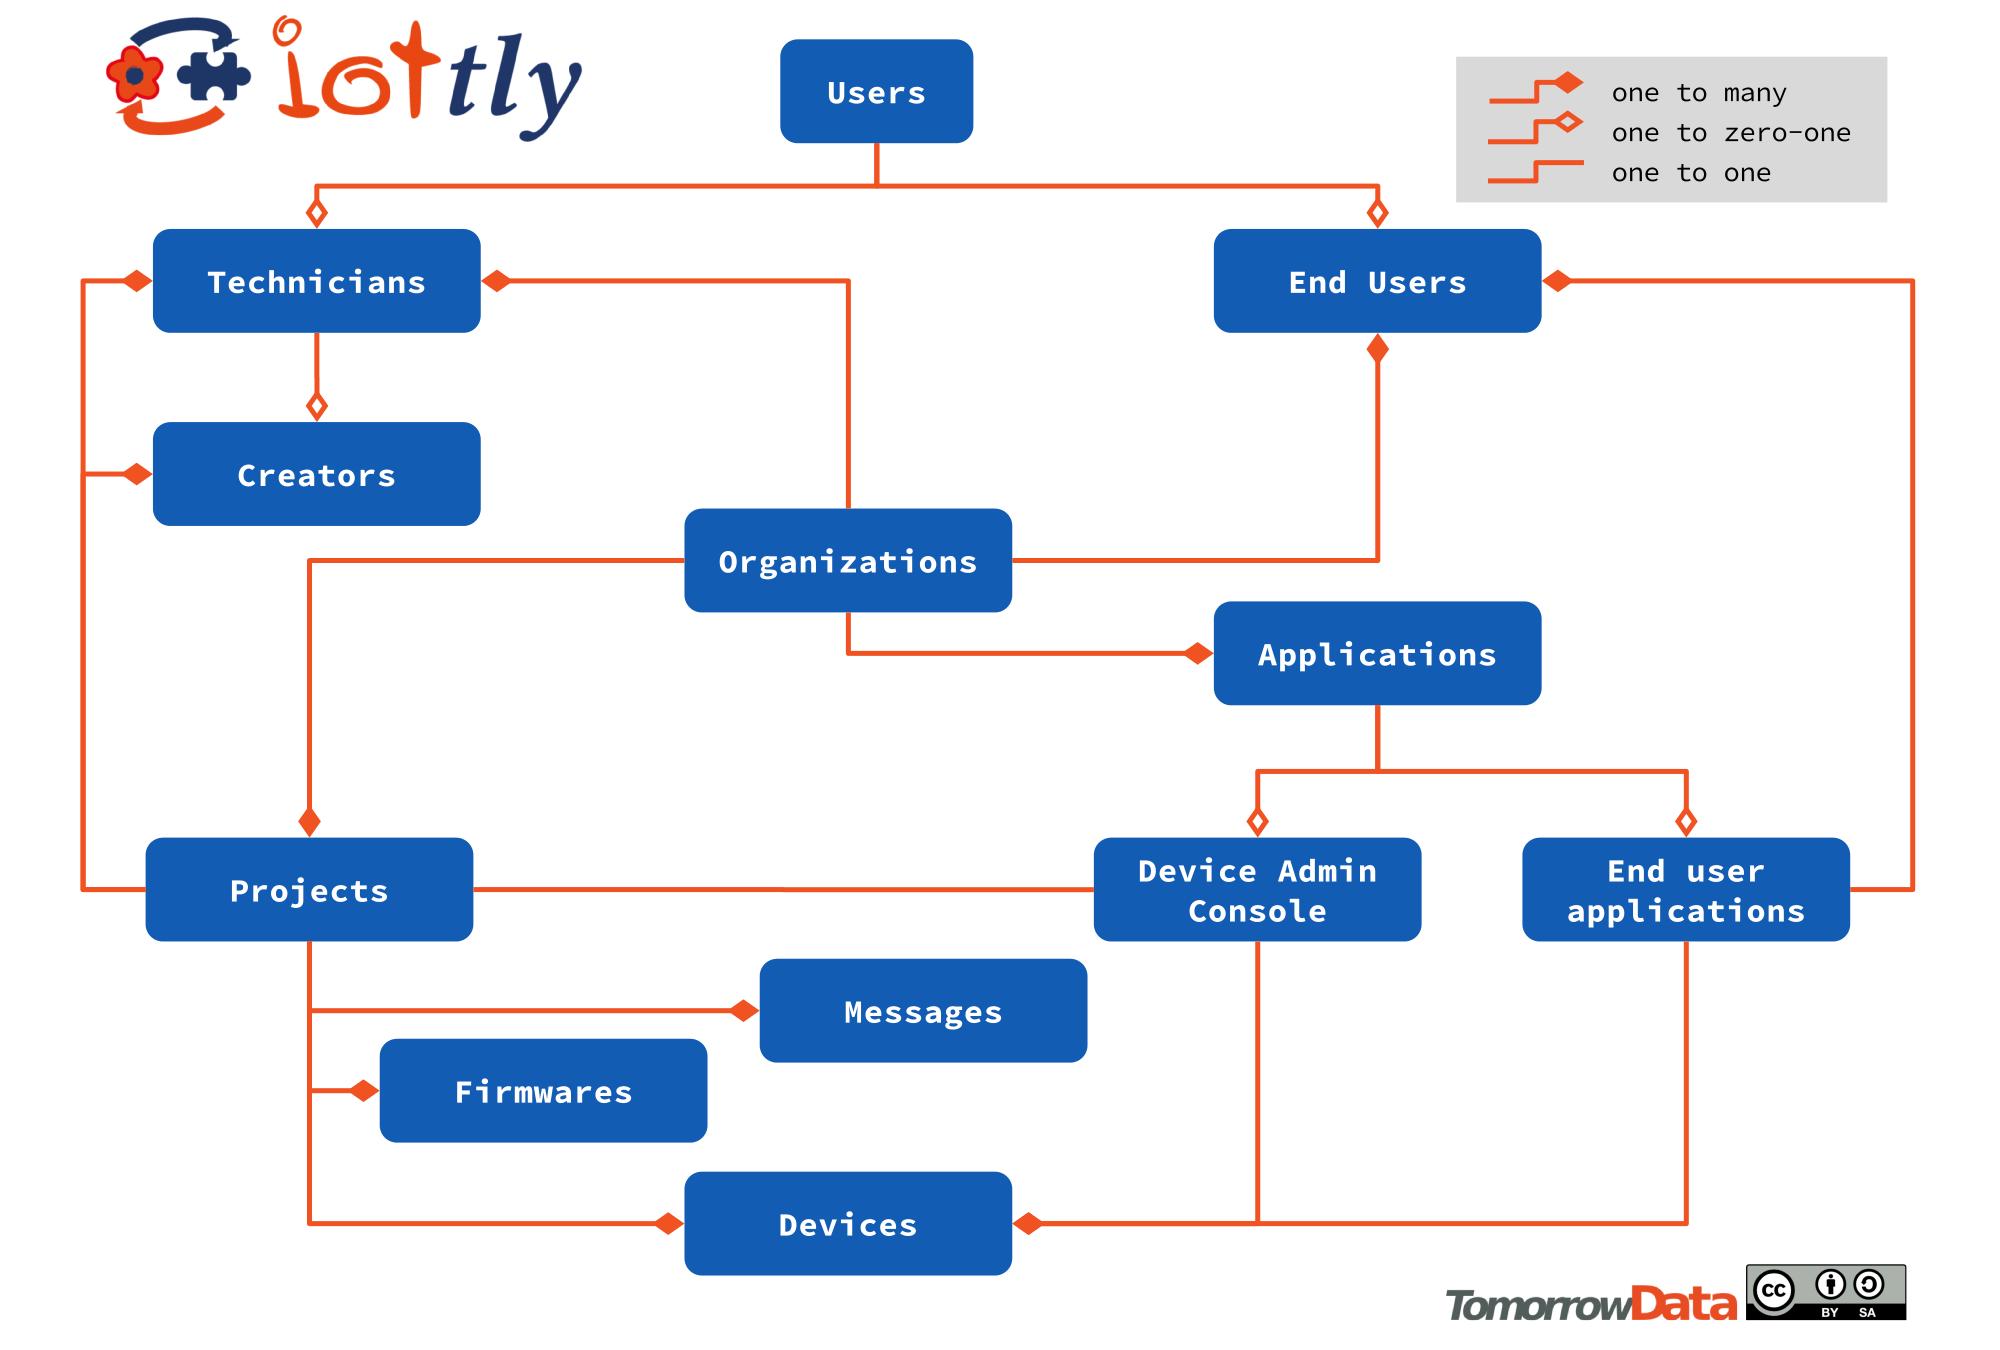 iottly-data-model